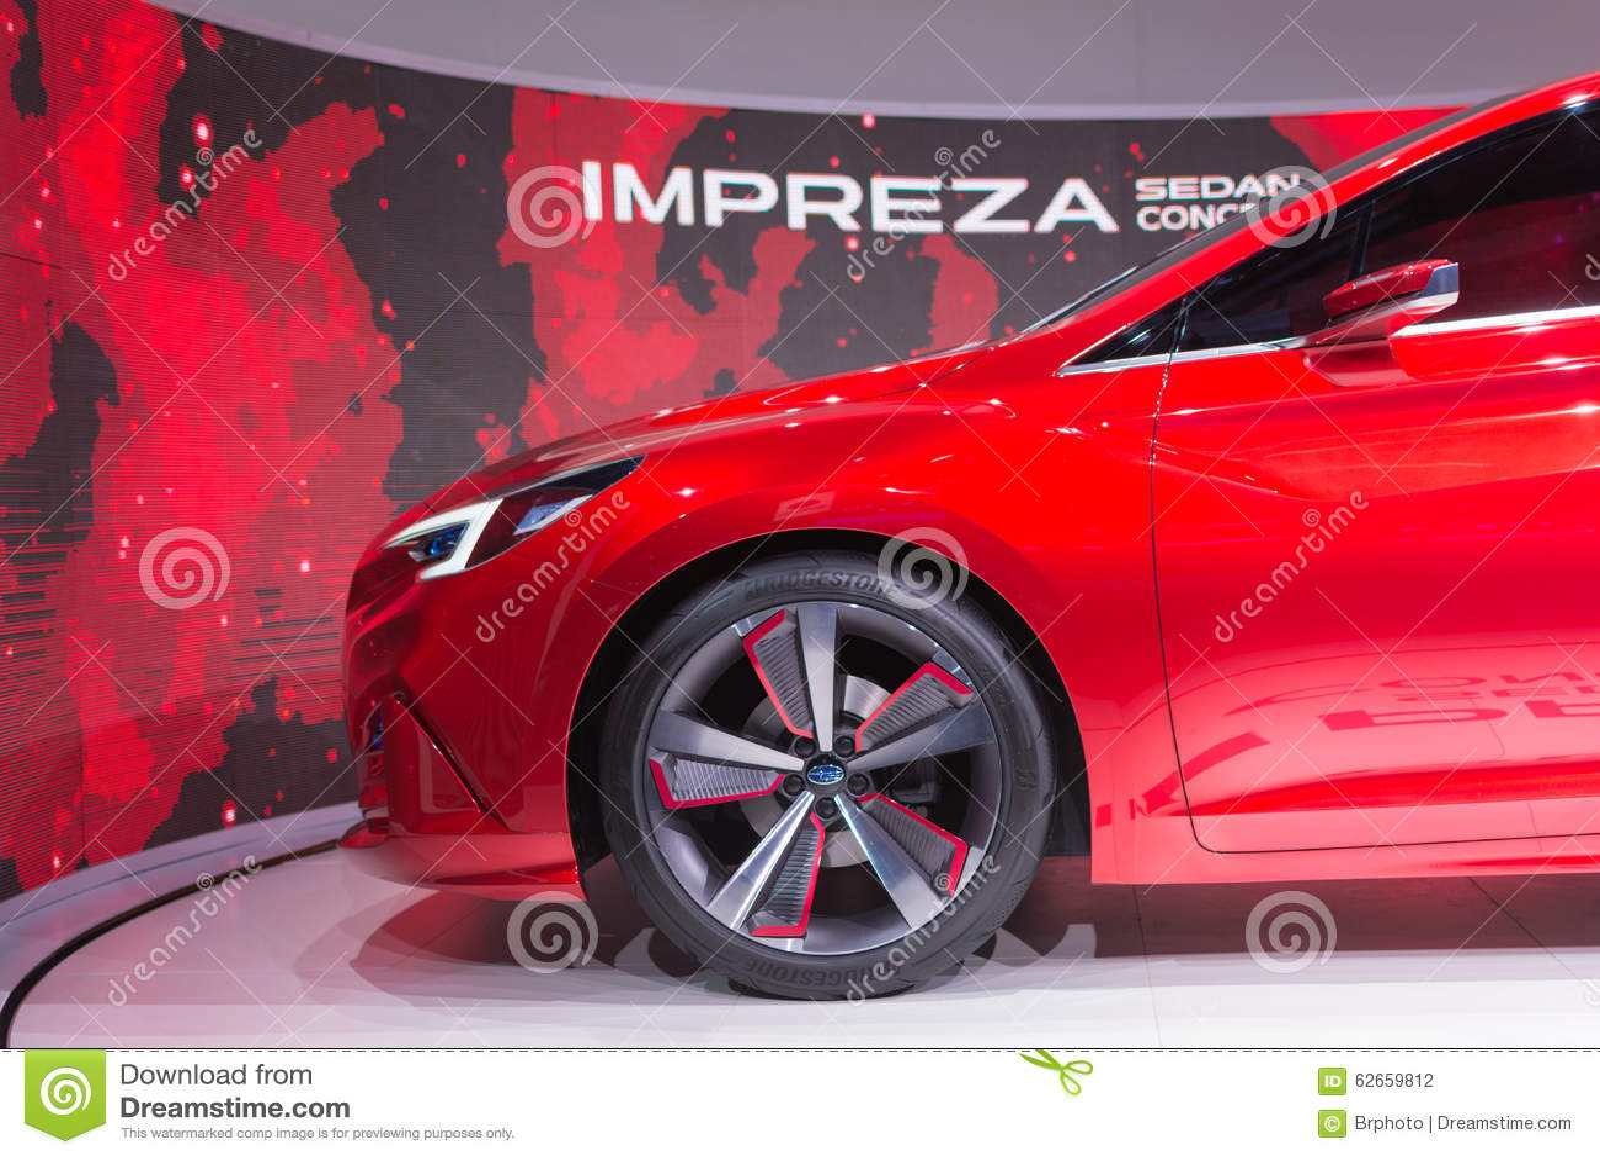 Subaru Impreza Sedan Concept Editorial Photography Image Of - Subaru car show california